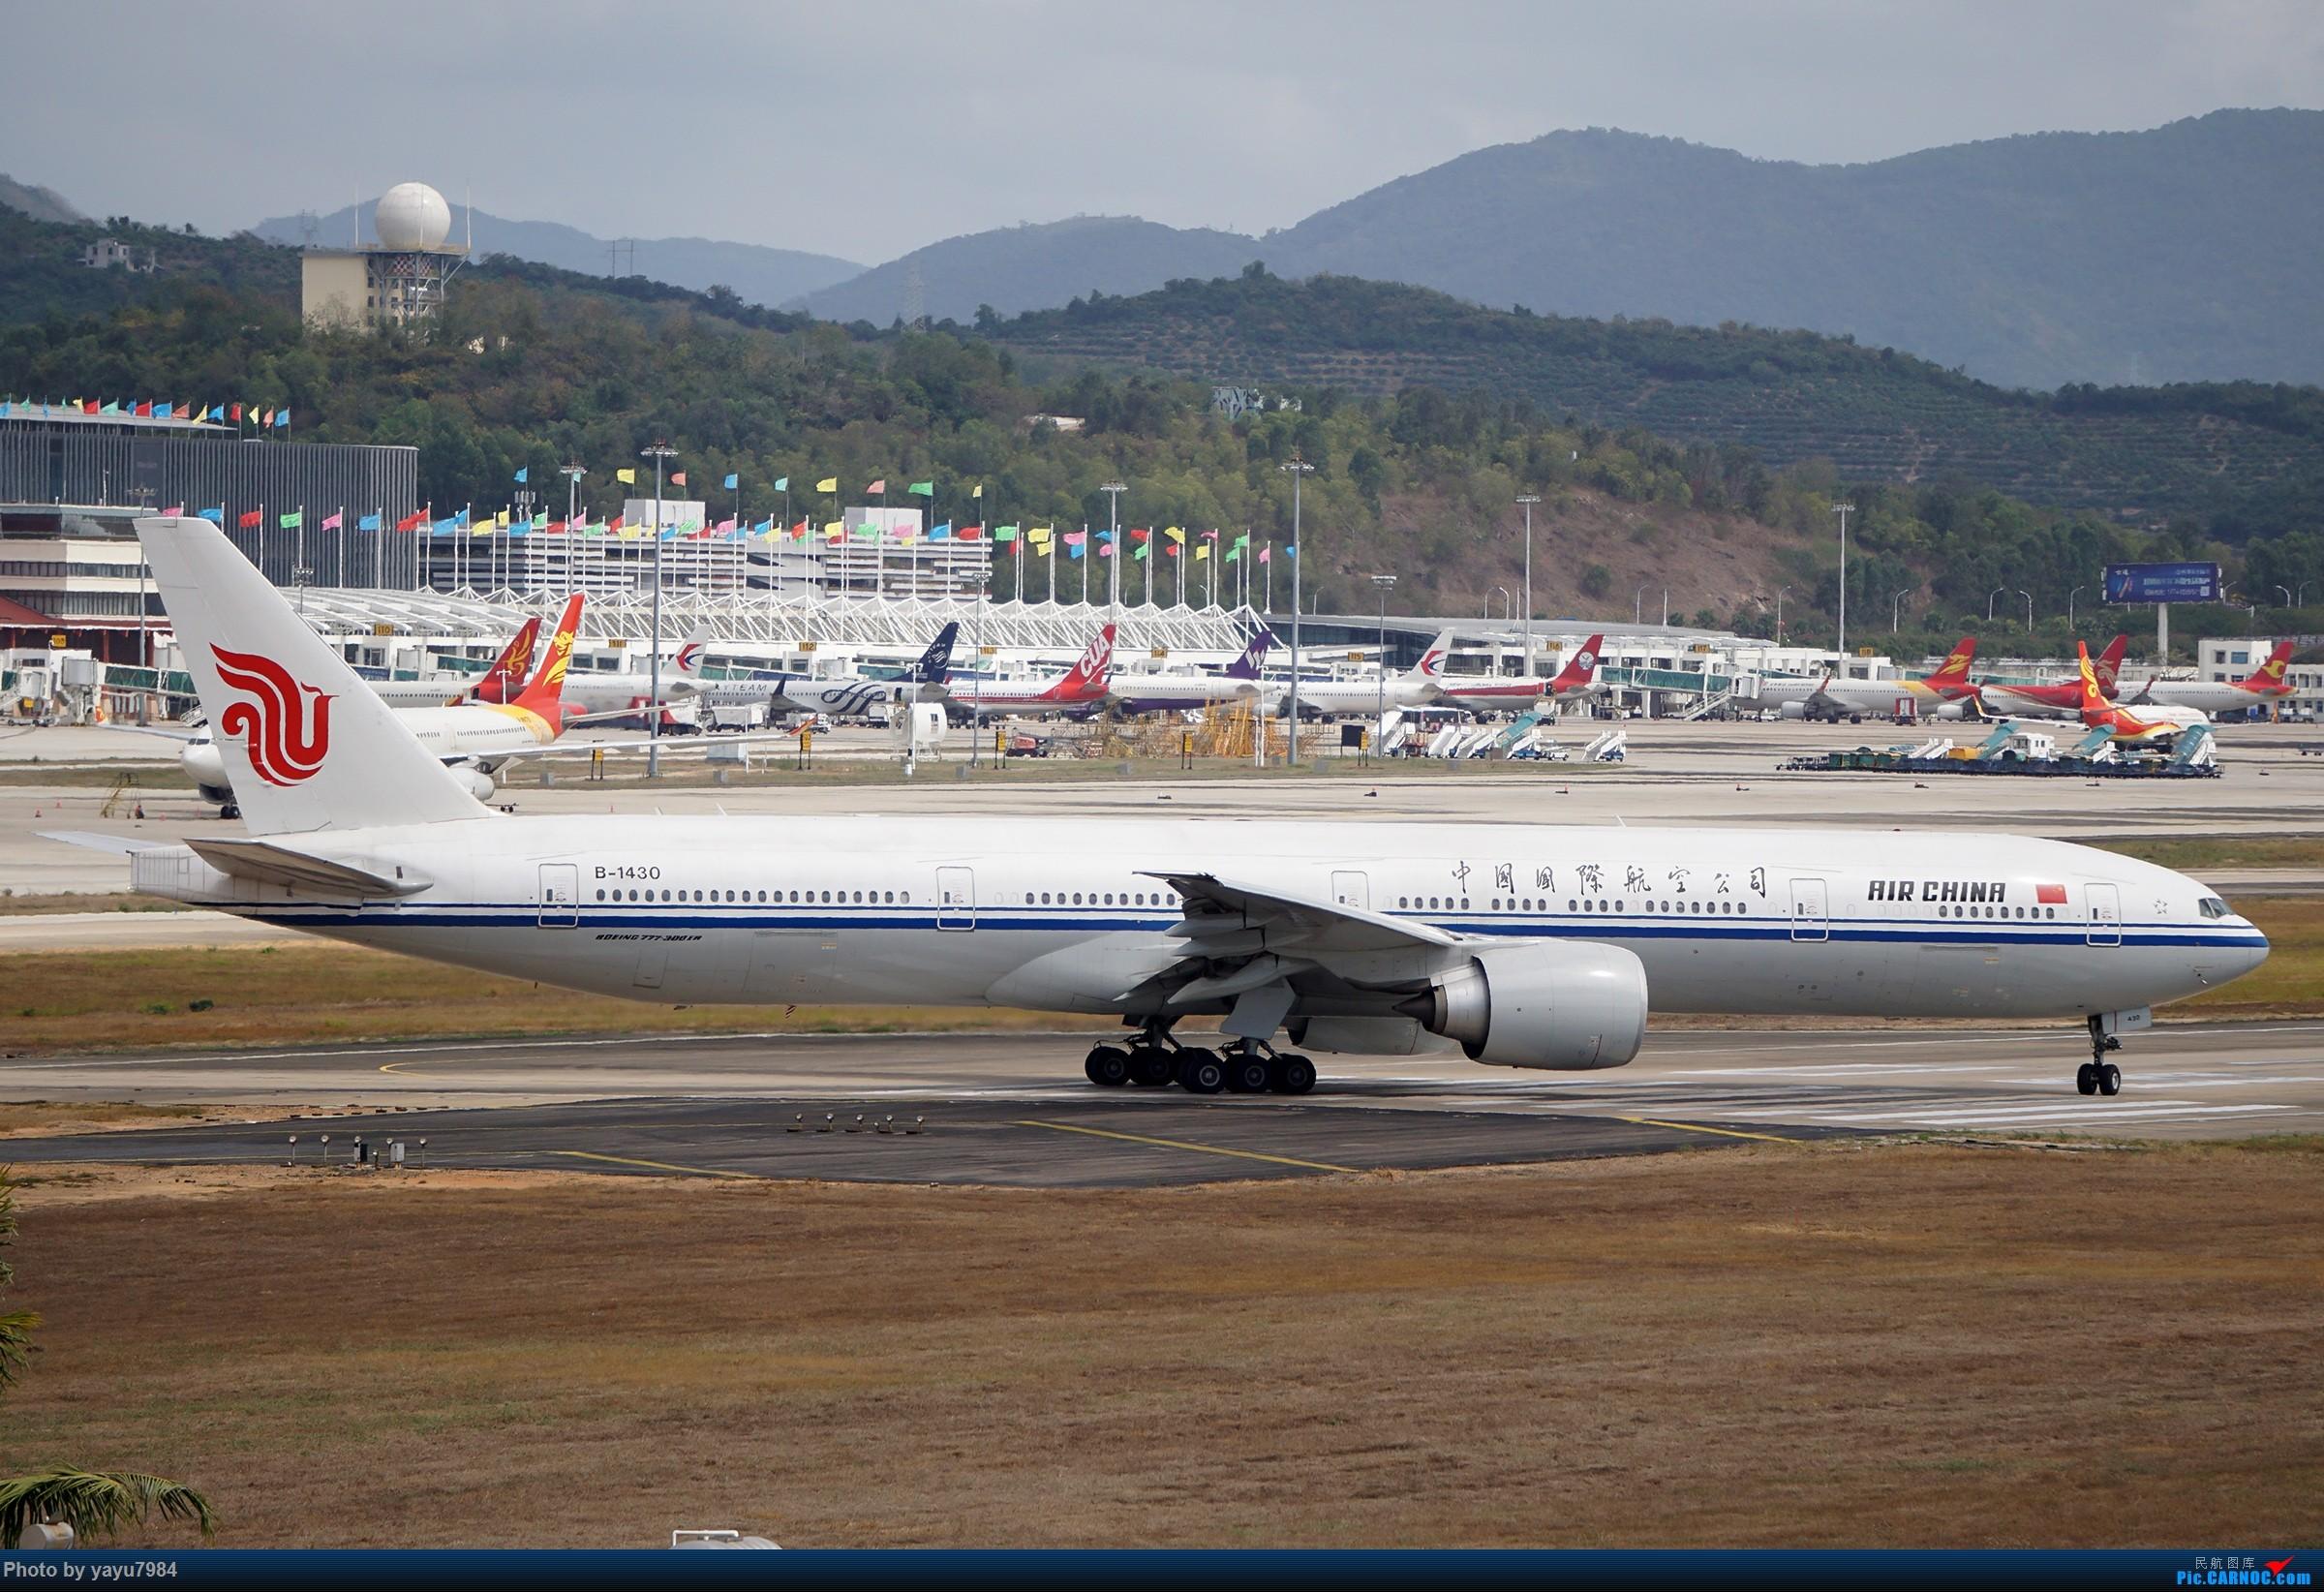 Re:[原创][SYX] 回国首拍,春运高峰时段的三亚凤凰国际机场 BOEING 777-300ER B-1430 中国三亚凤凰国际机场